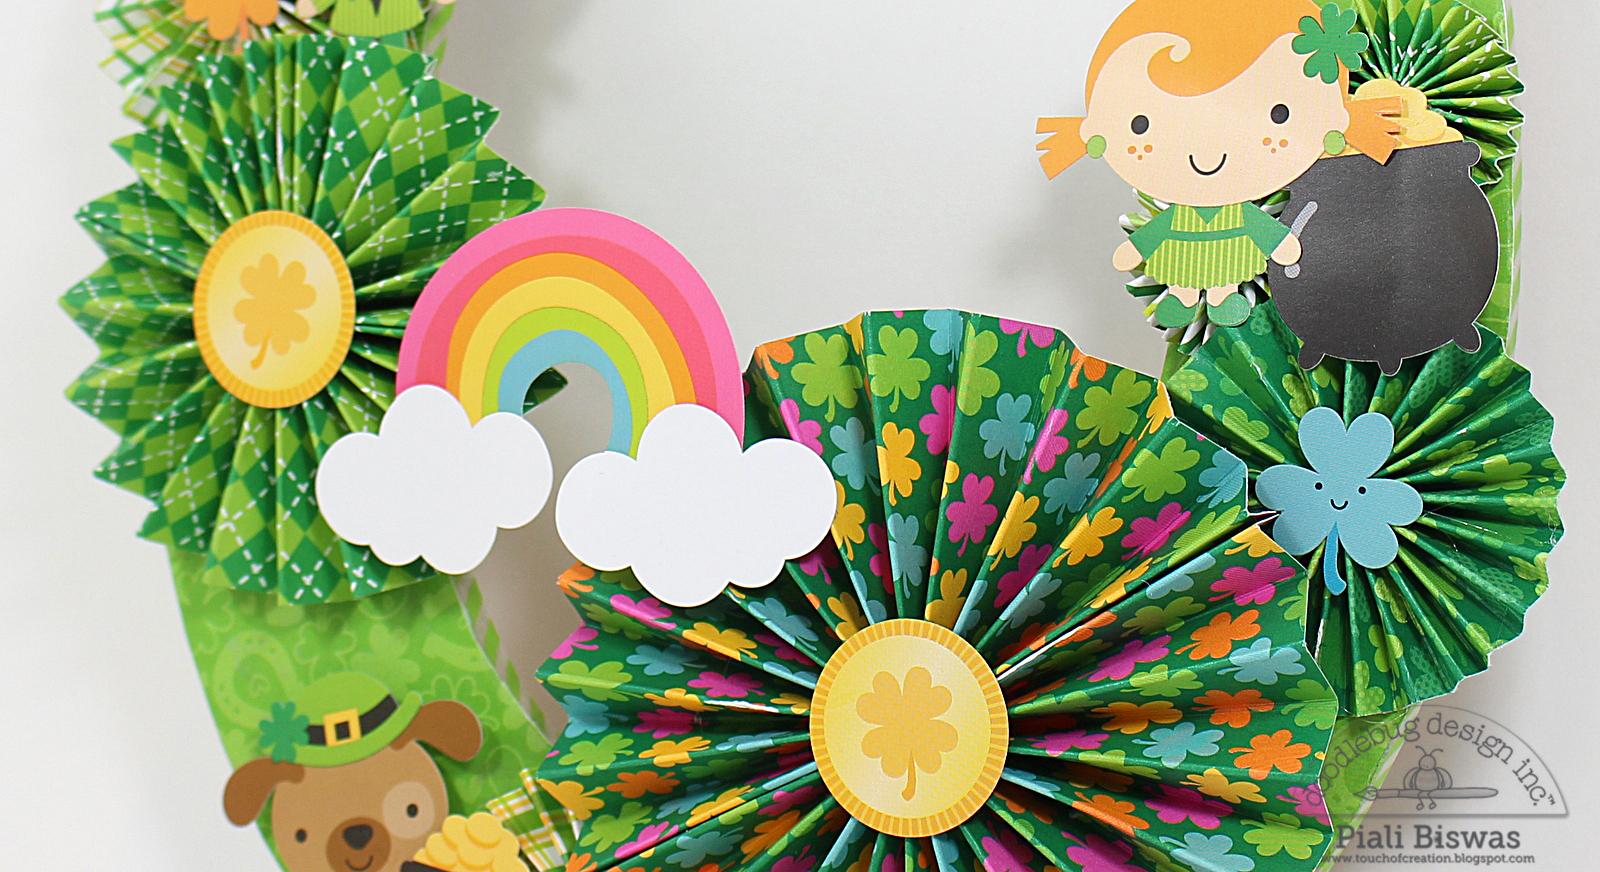 Doodlebug Design Inc Blog: Happy-Go-Lucky Collection: Home